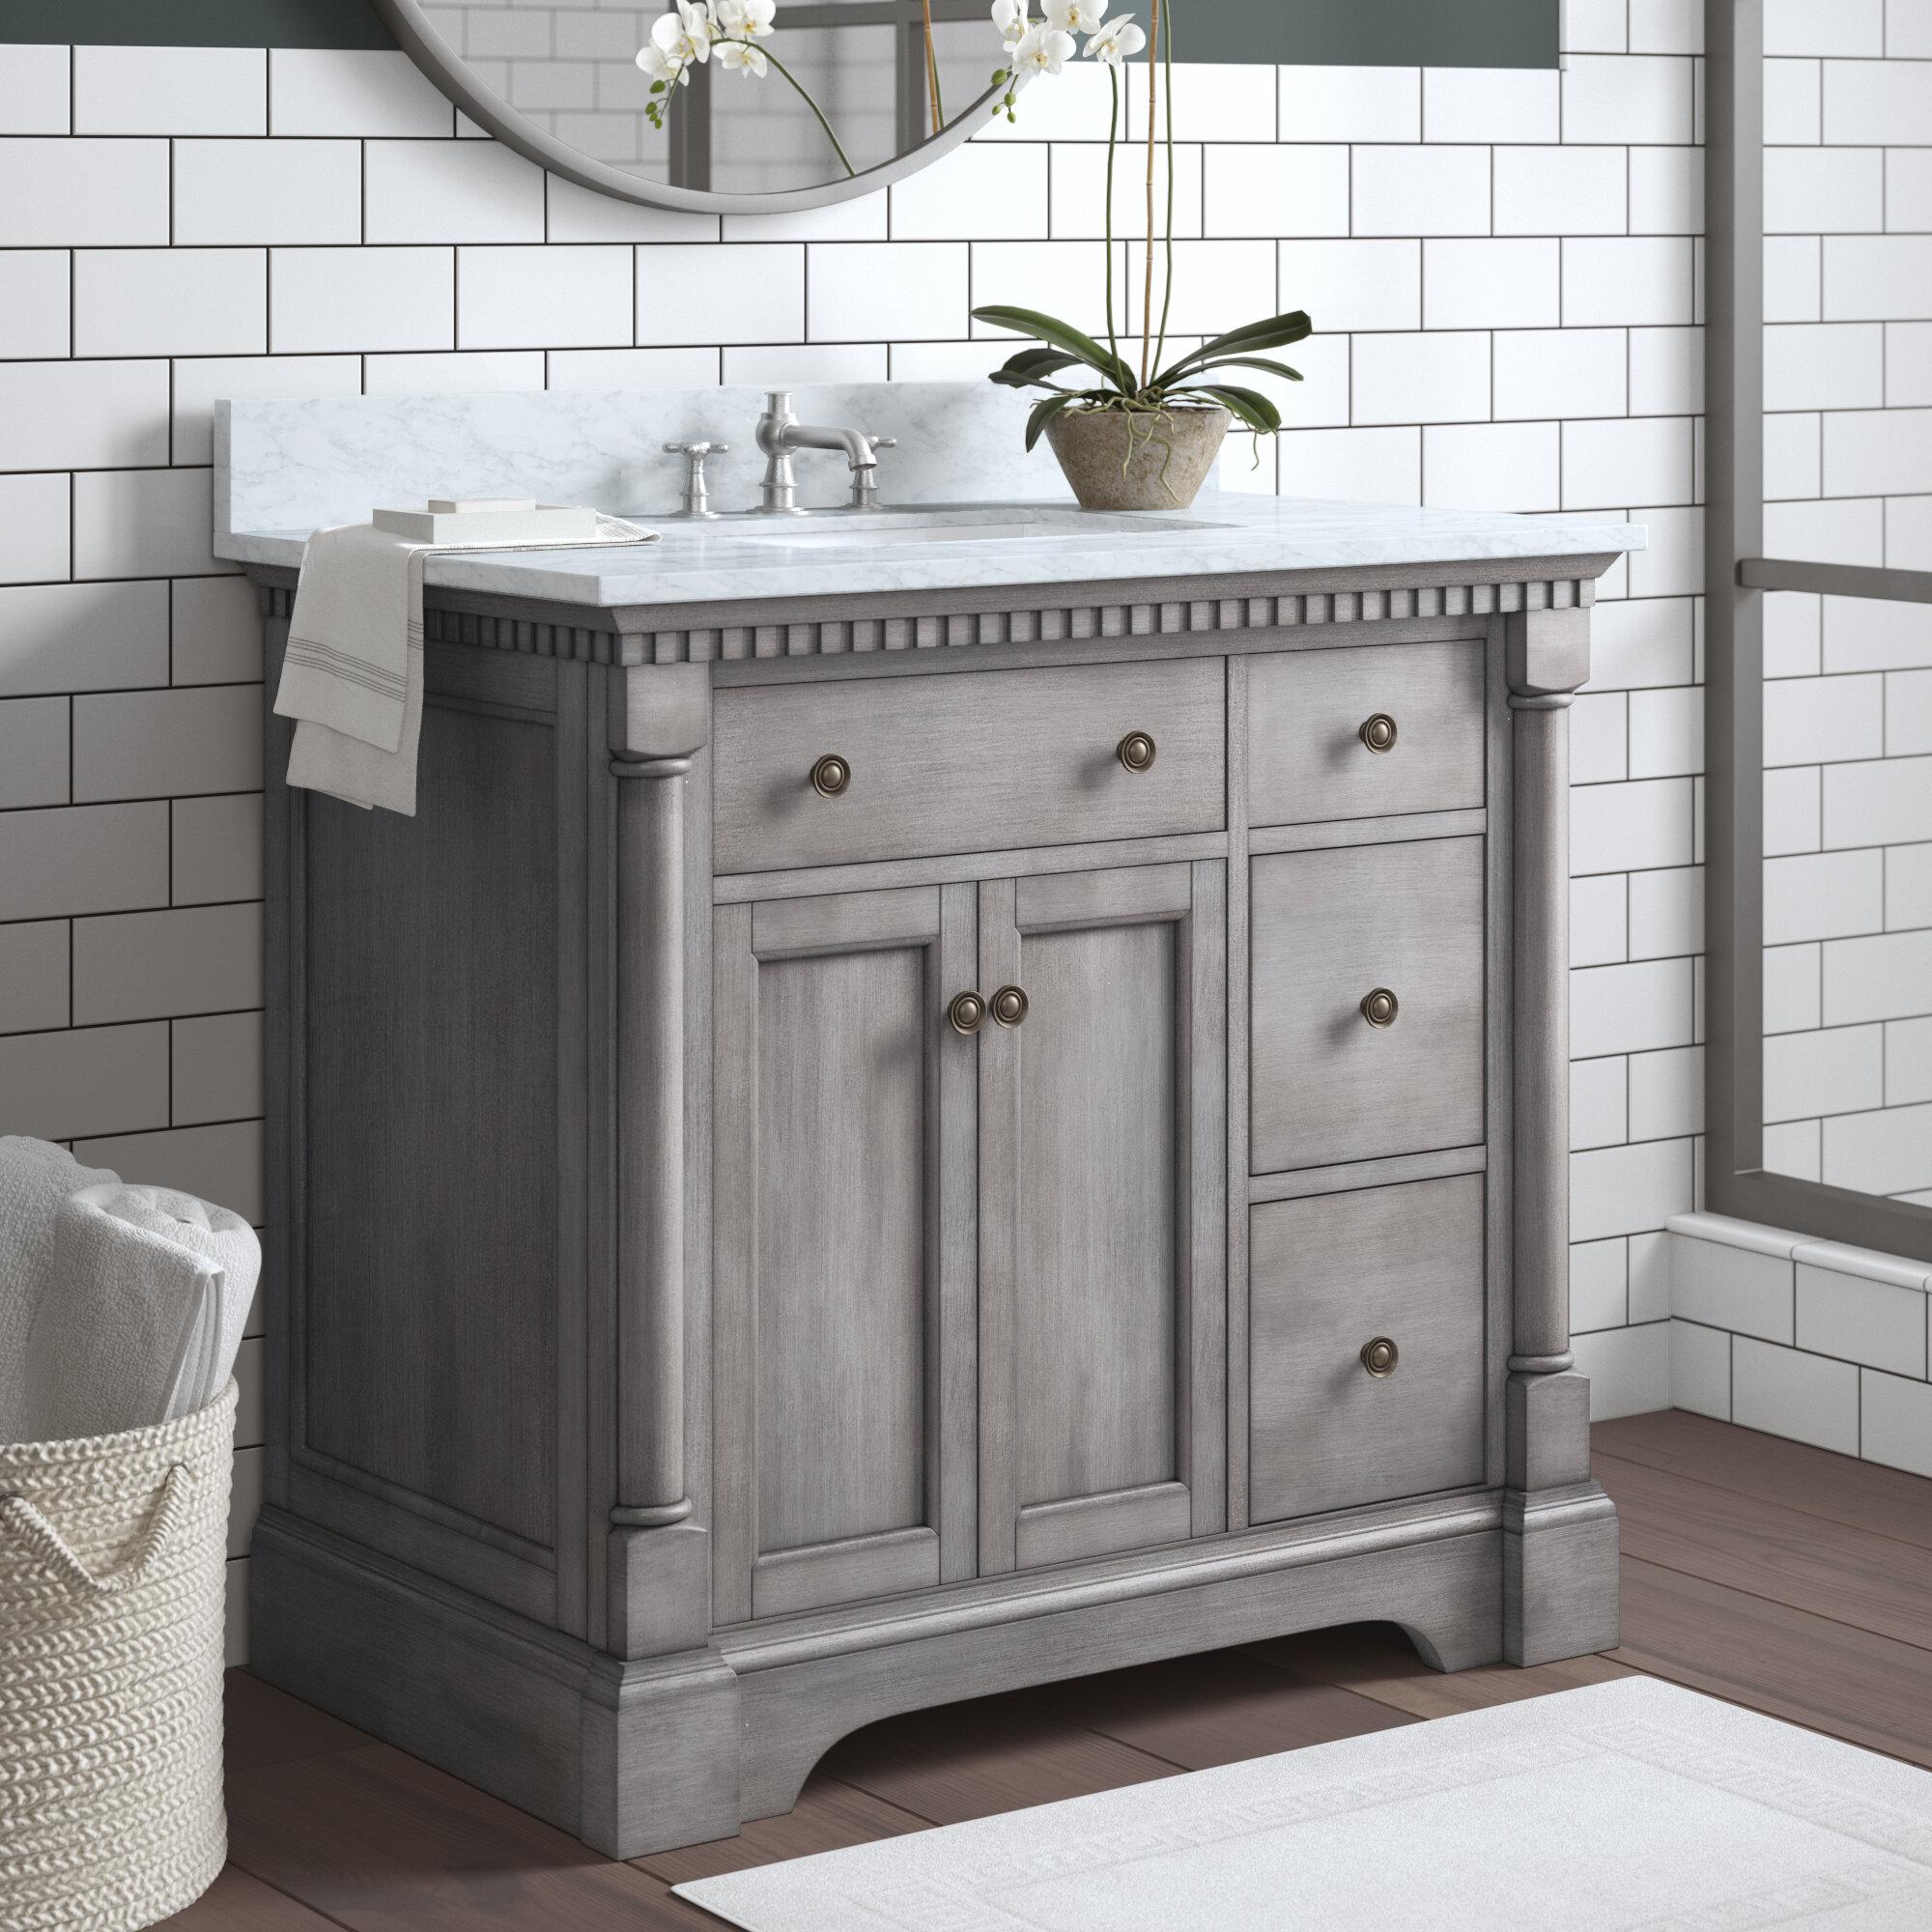 Bathroom Vanities.Seadrift 37 Single Bathroom Vanity Set